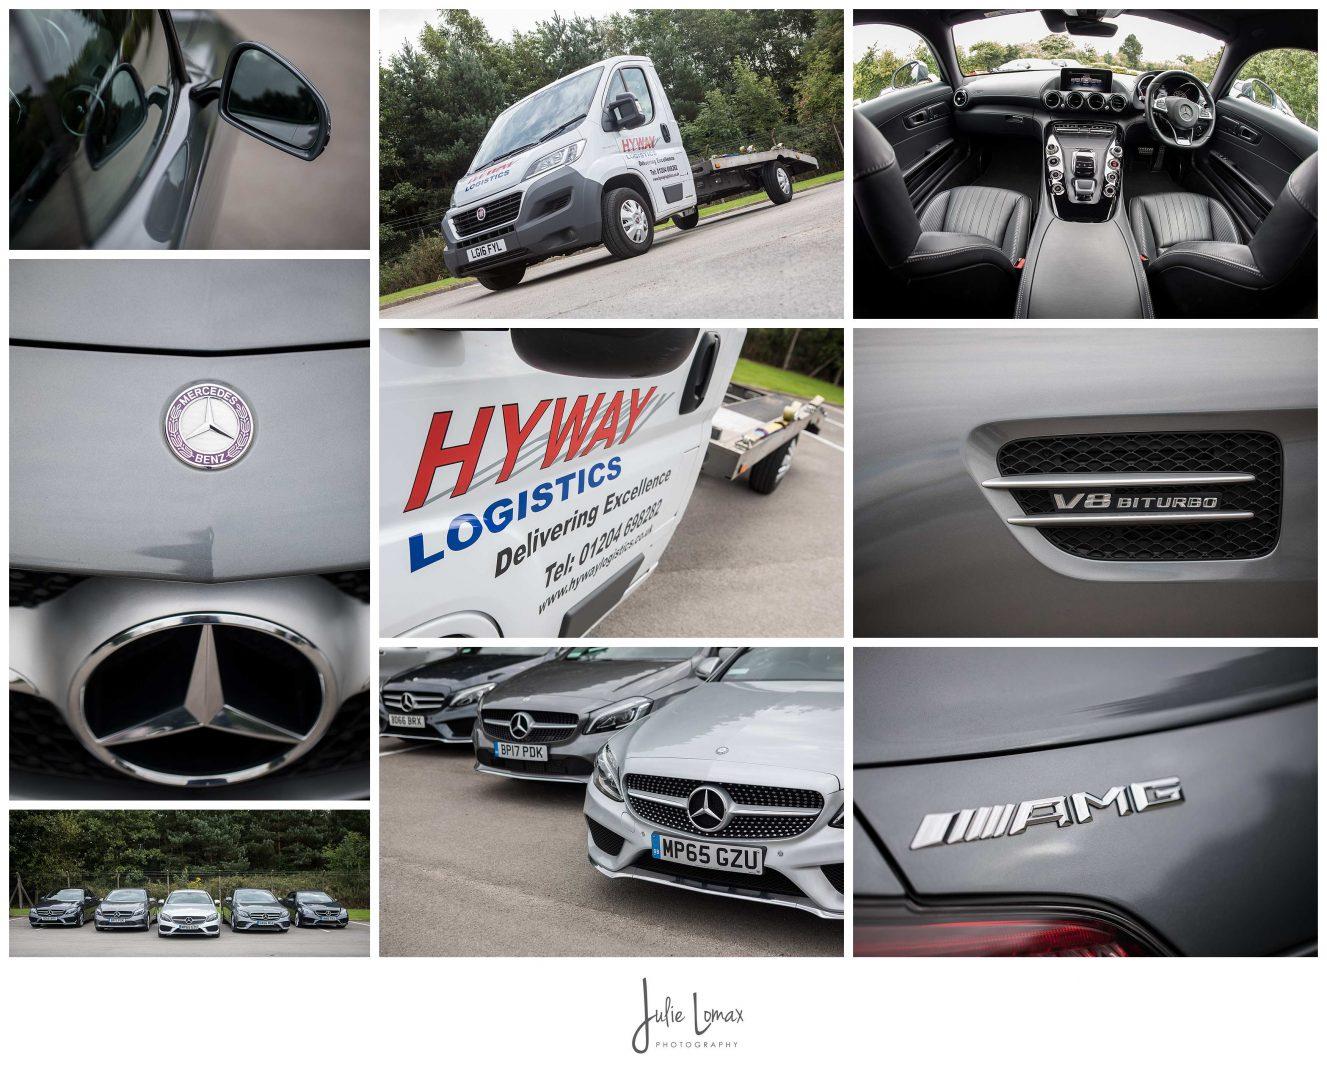 Website Photography, Business Photographer, Documentary Photographer, Horwich Photographer, Hyway Logistics, Horwich